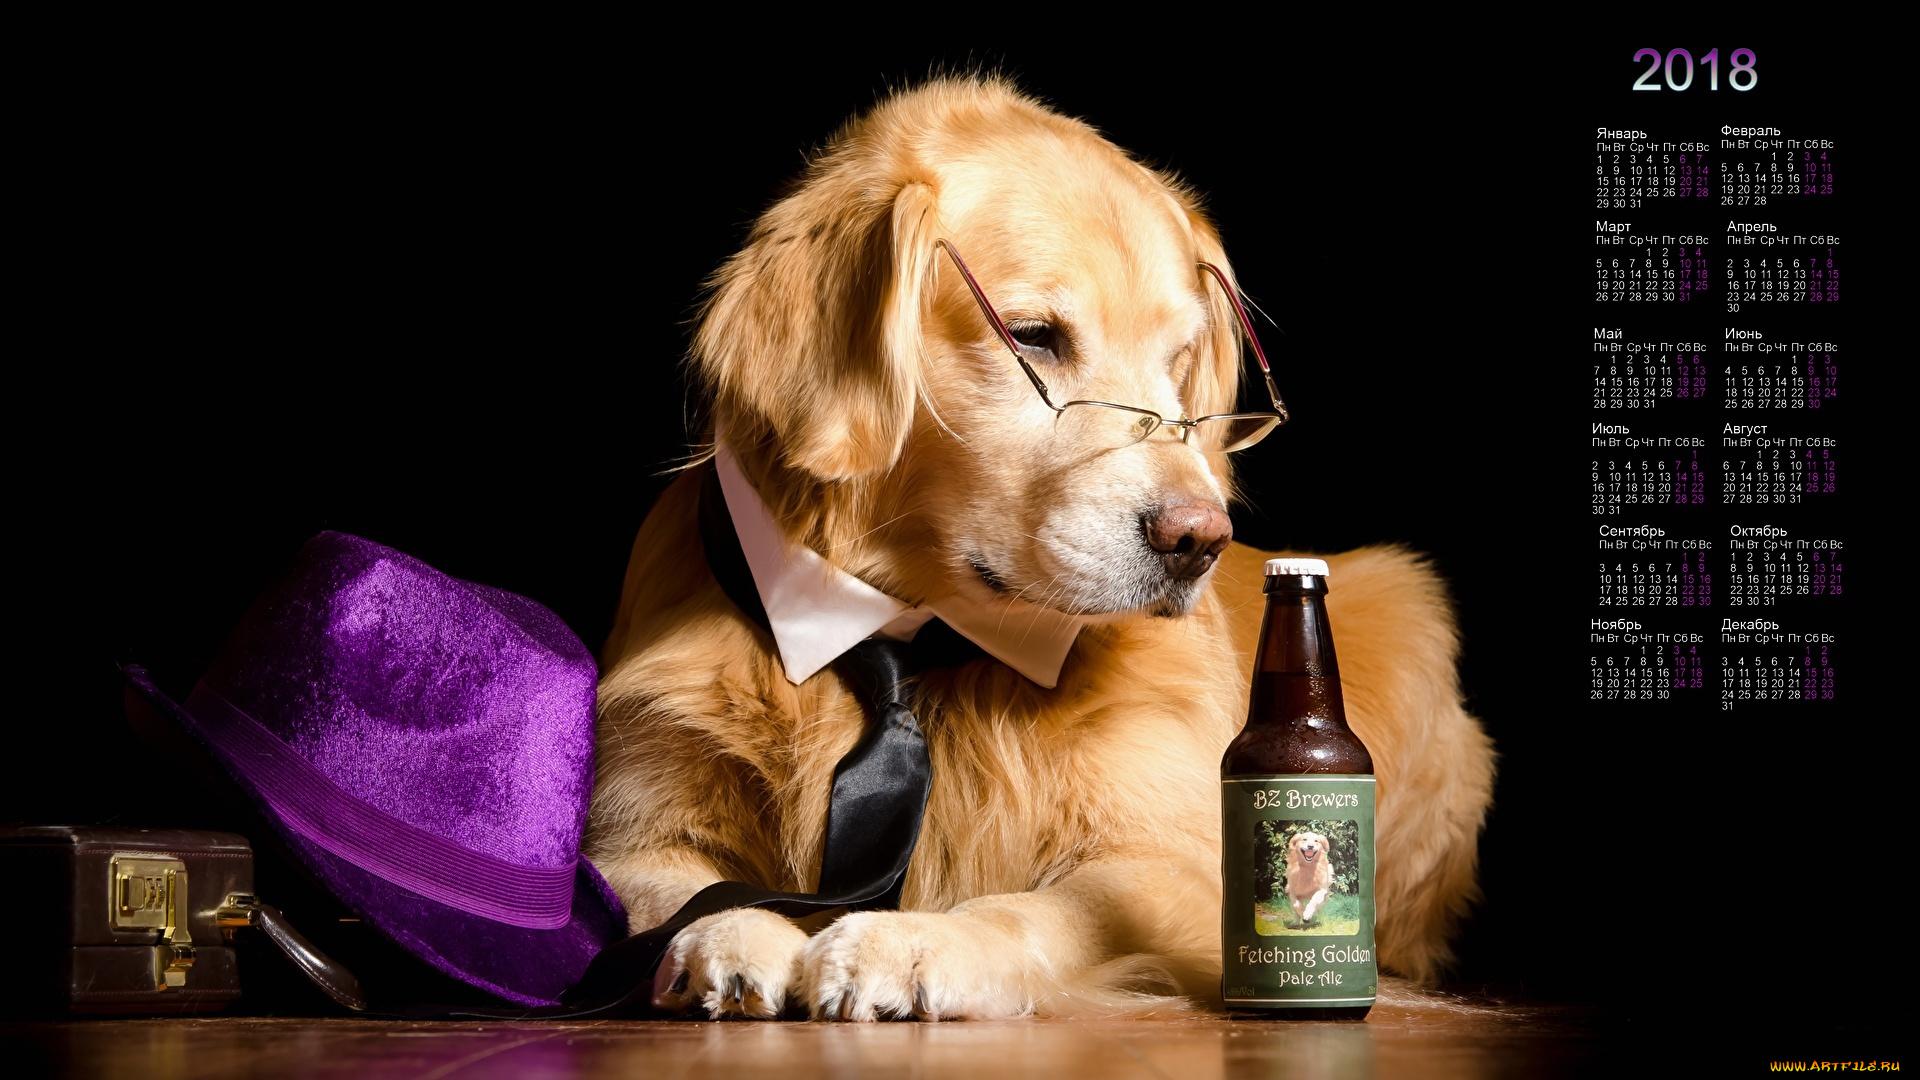 ретривер собака пиво бутылка очки смотреть